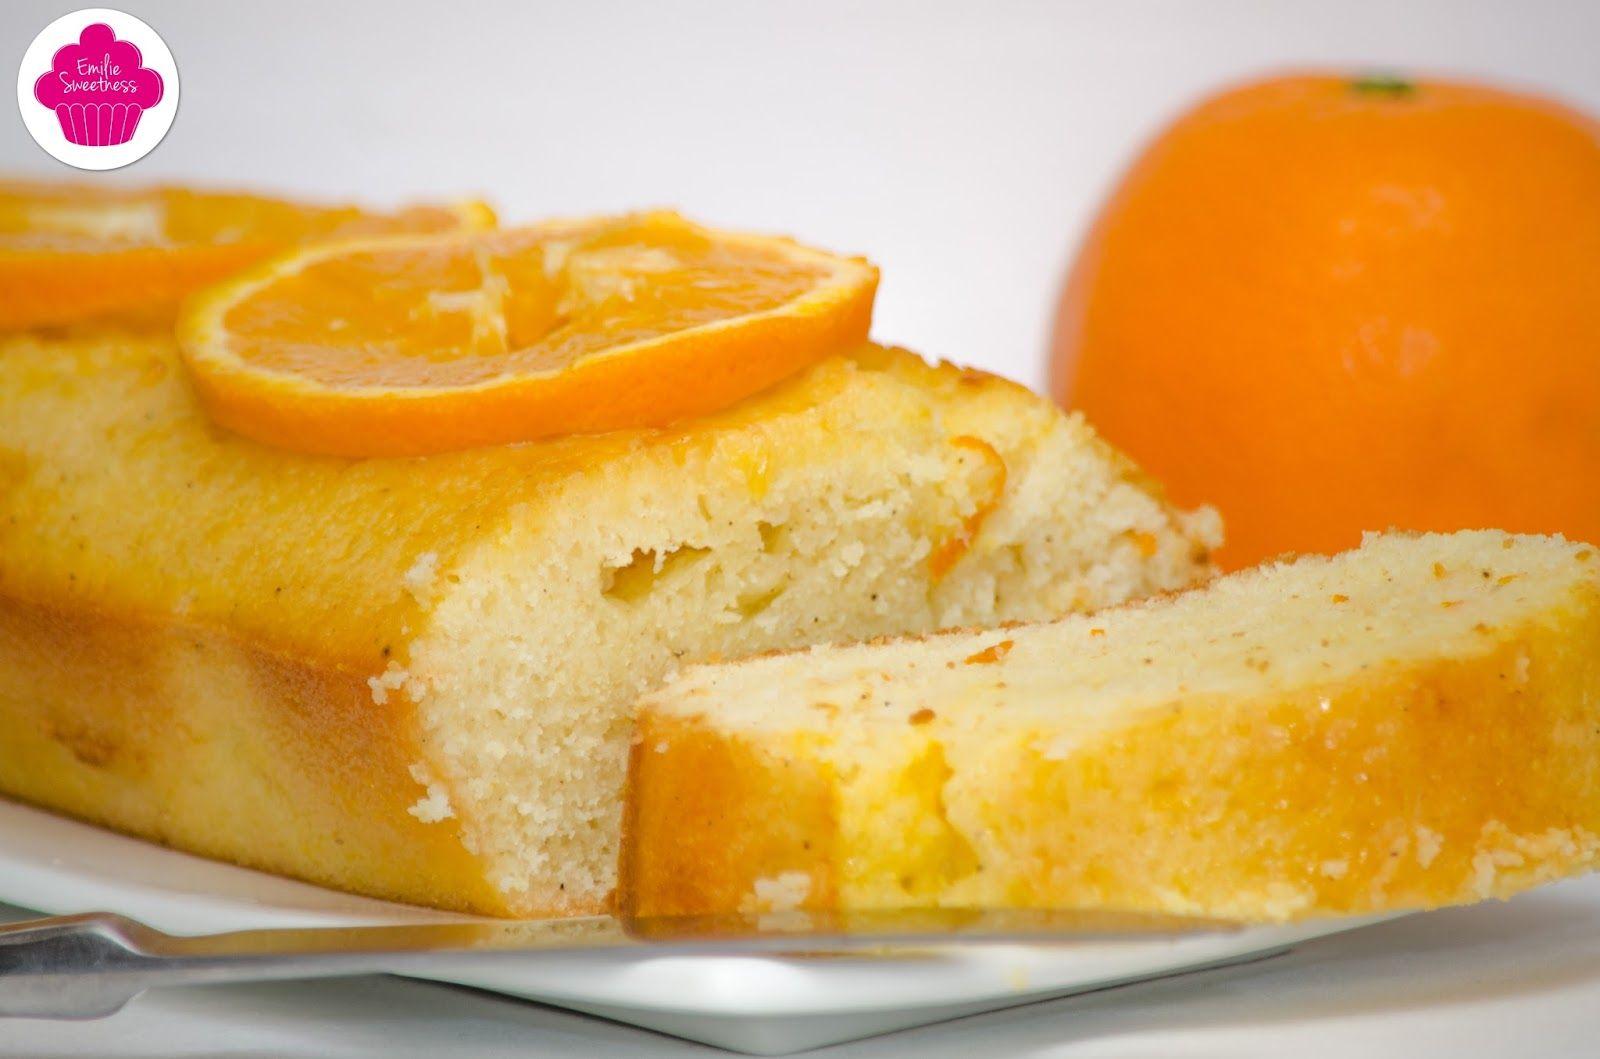 Cake à l'orange sans gluten sans lactose http://emiliesweetness.blogspot.co.uk/2016/08/cake-lorange-imbibe-sans-gluten-sans.html?m=1